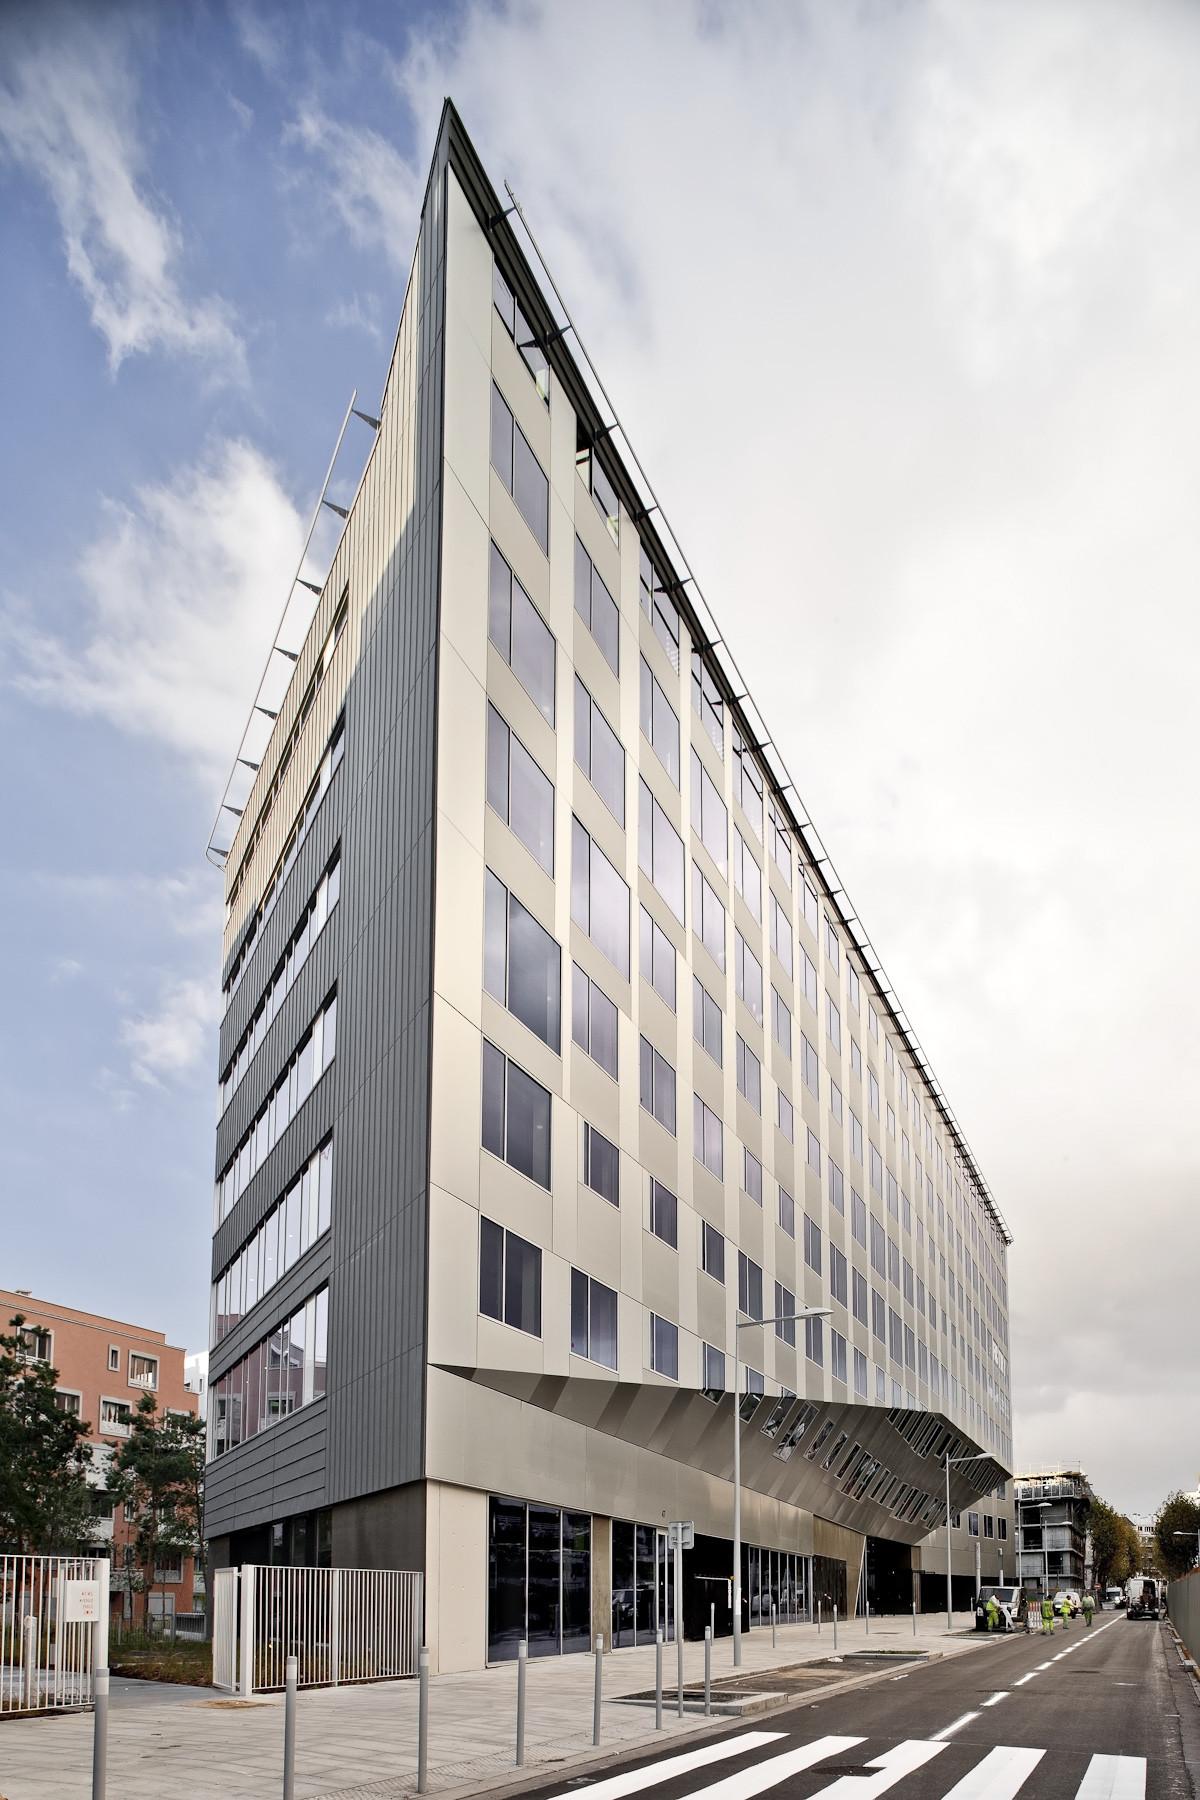 La Factory / Mateo Arquitectura